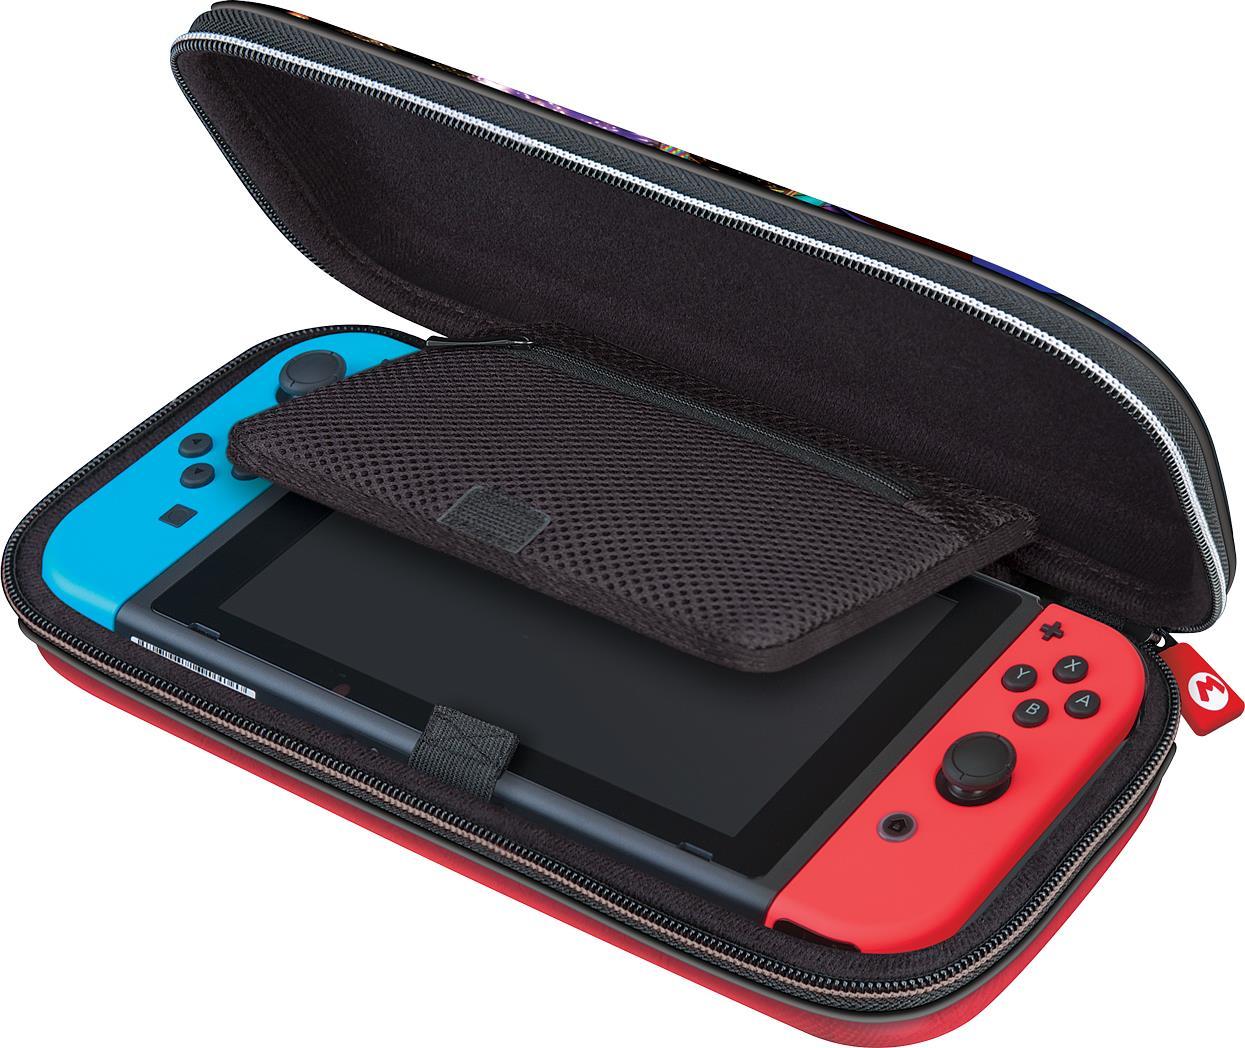 Miglior custodia Nintendo Switch